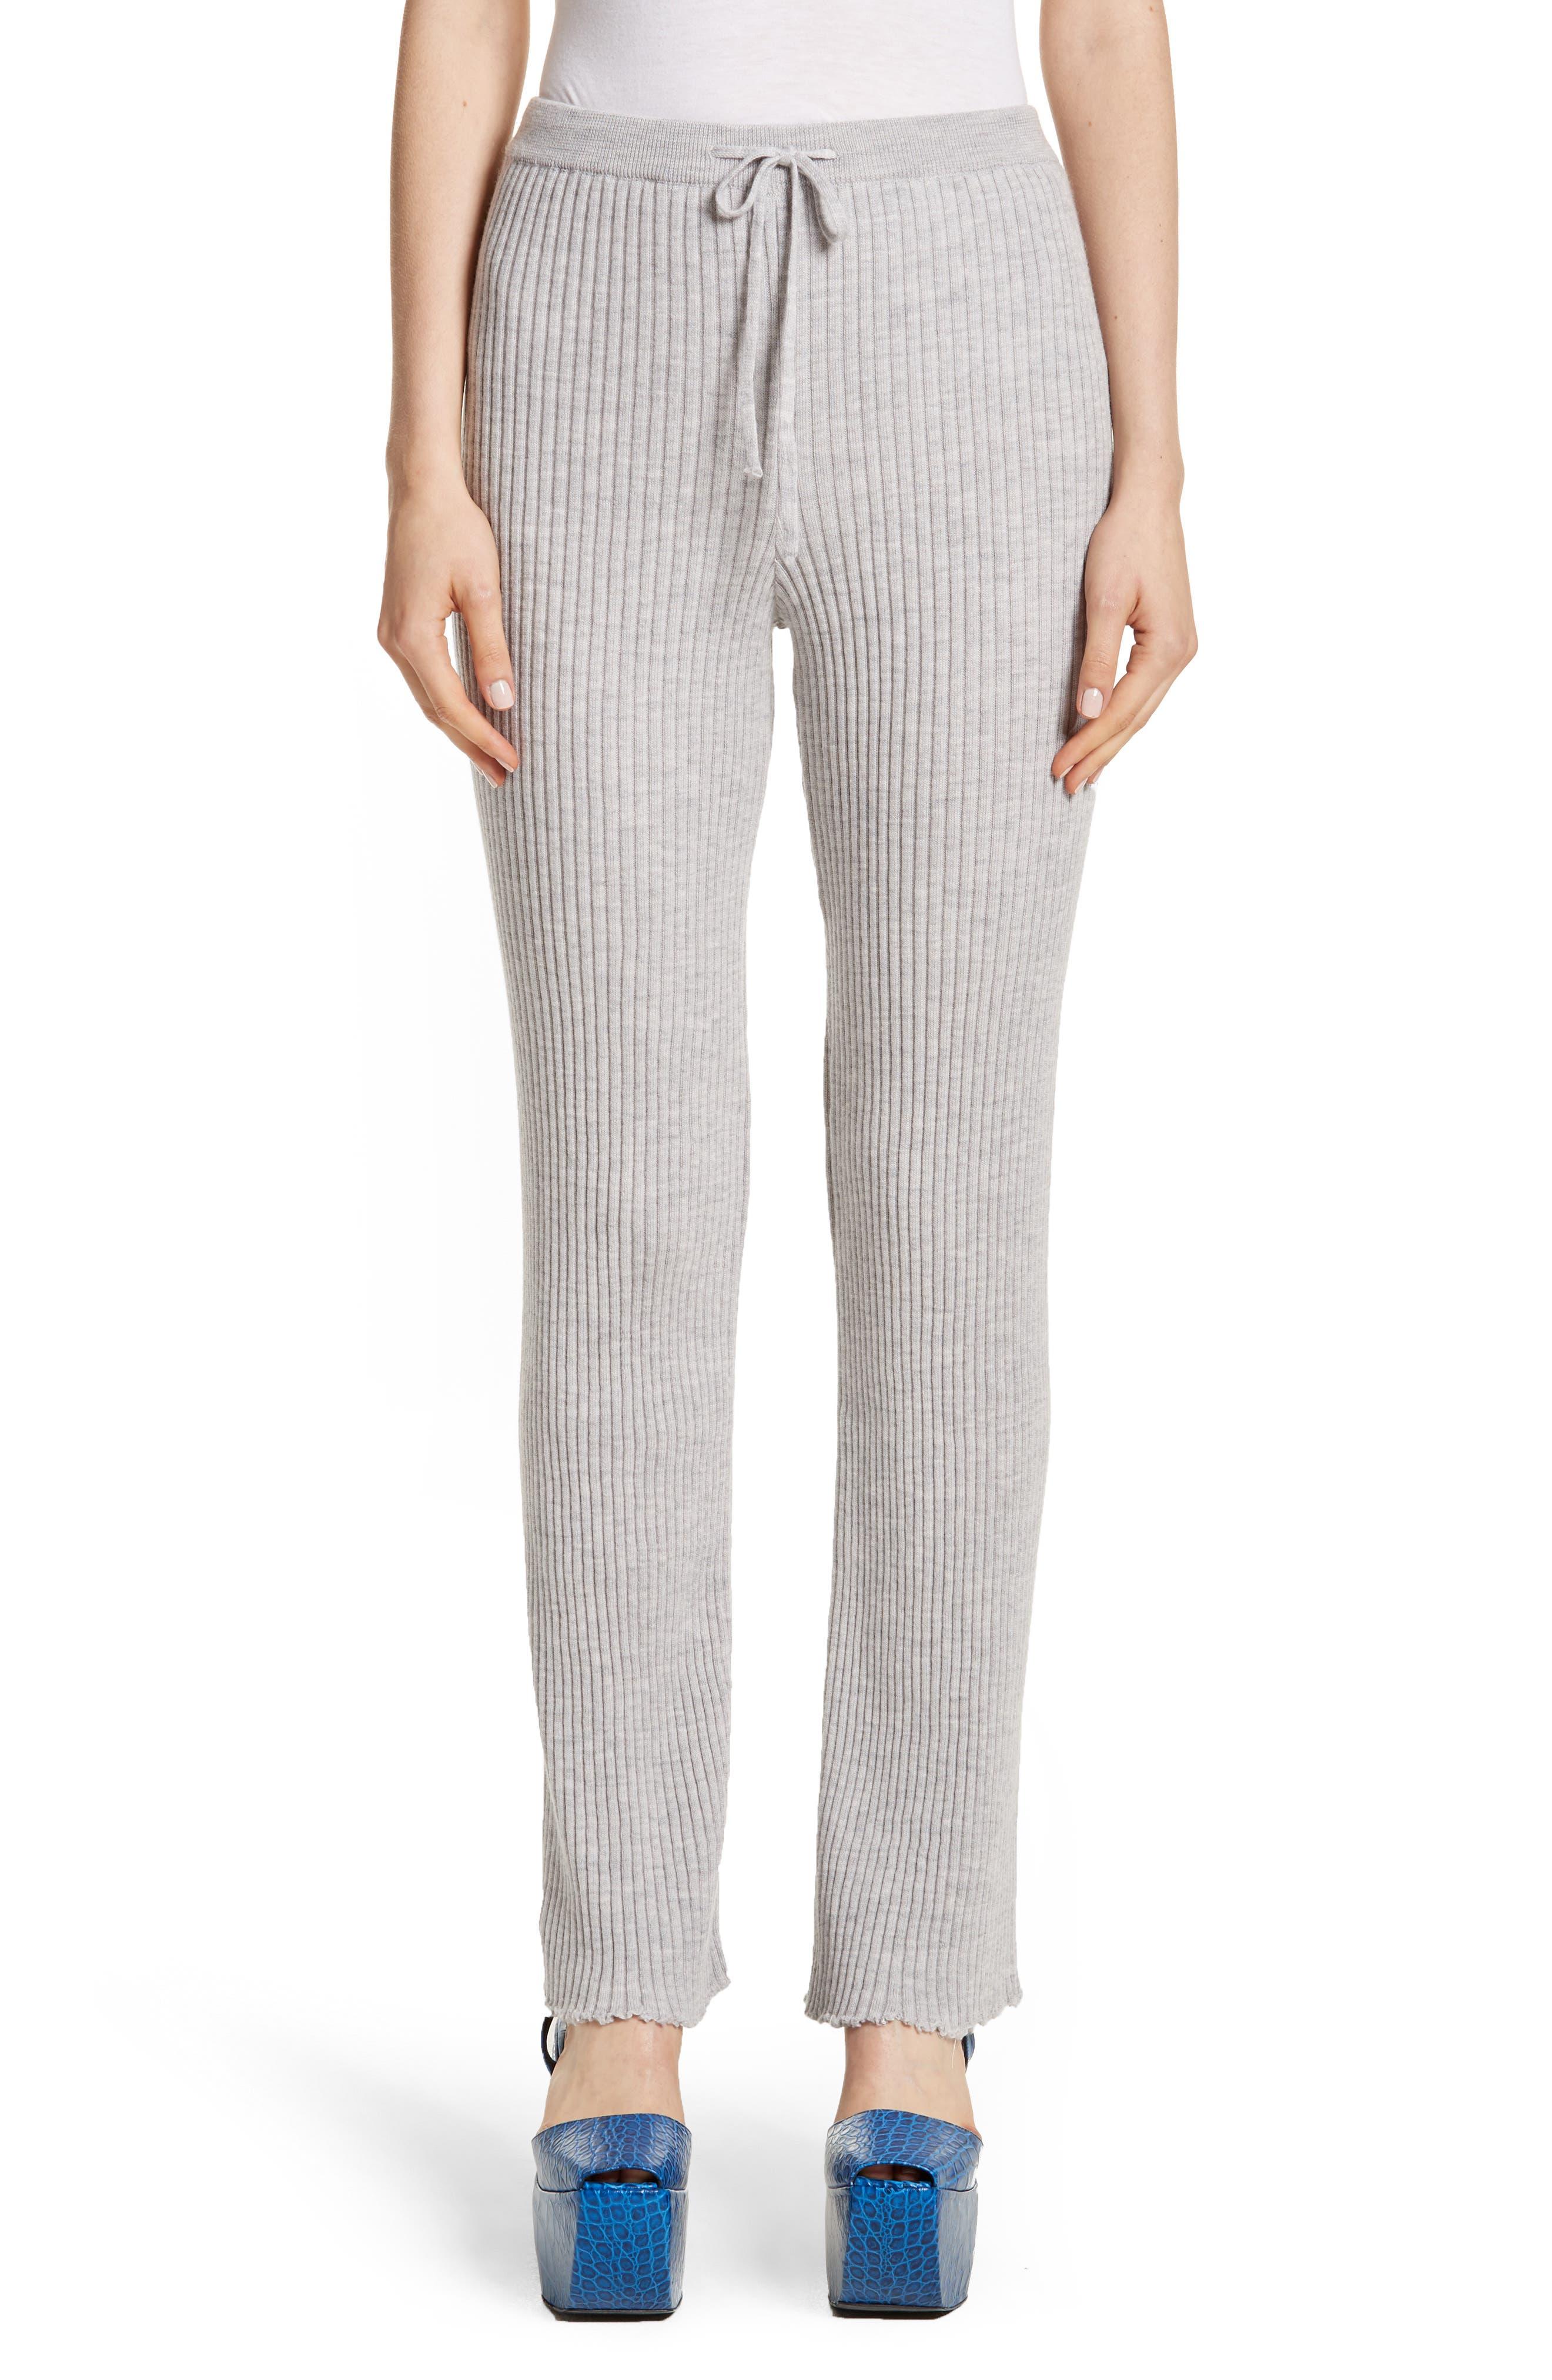 Marques'Almeida Ribbed Drawstring Sweatpants,                         Main,                         color, Grey